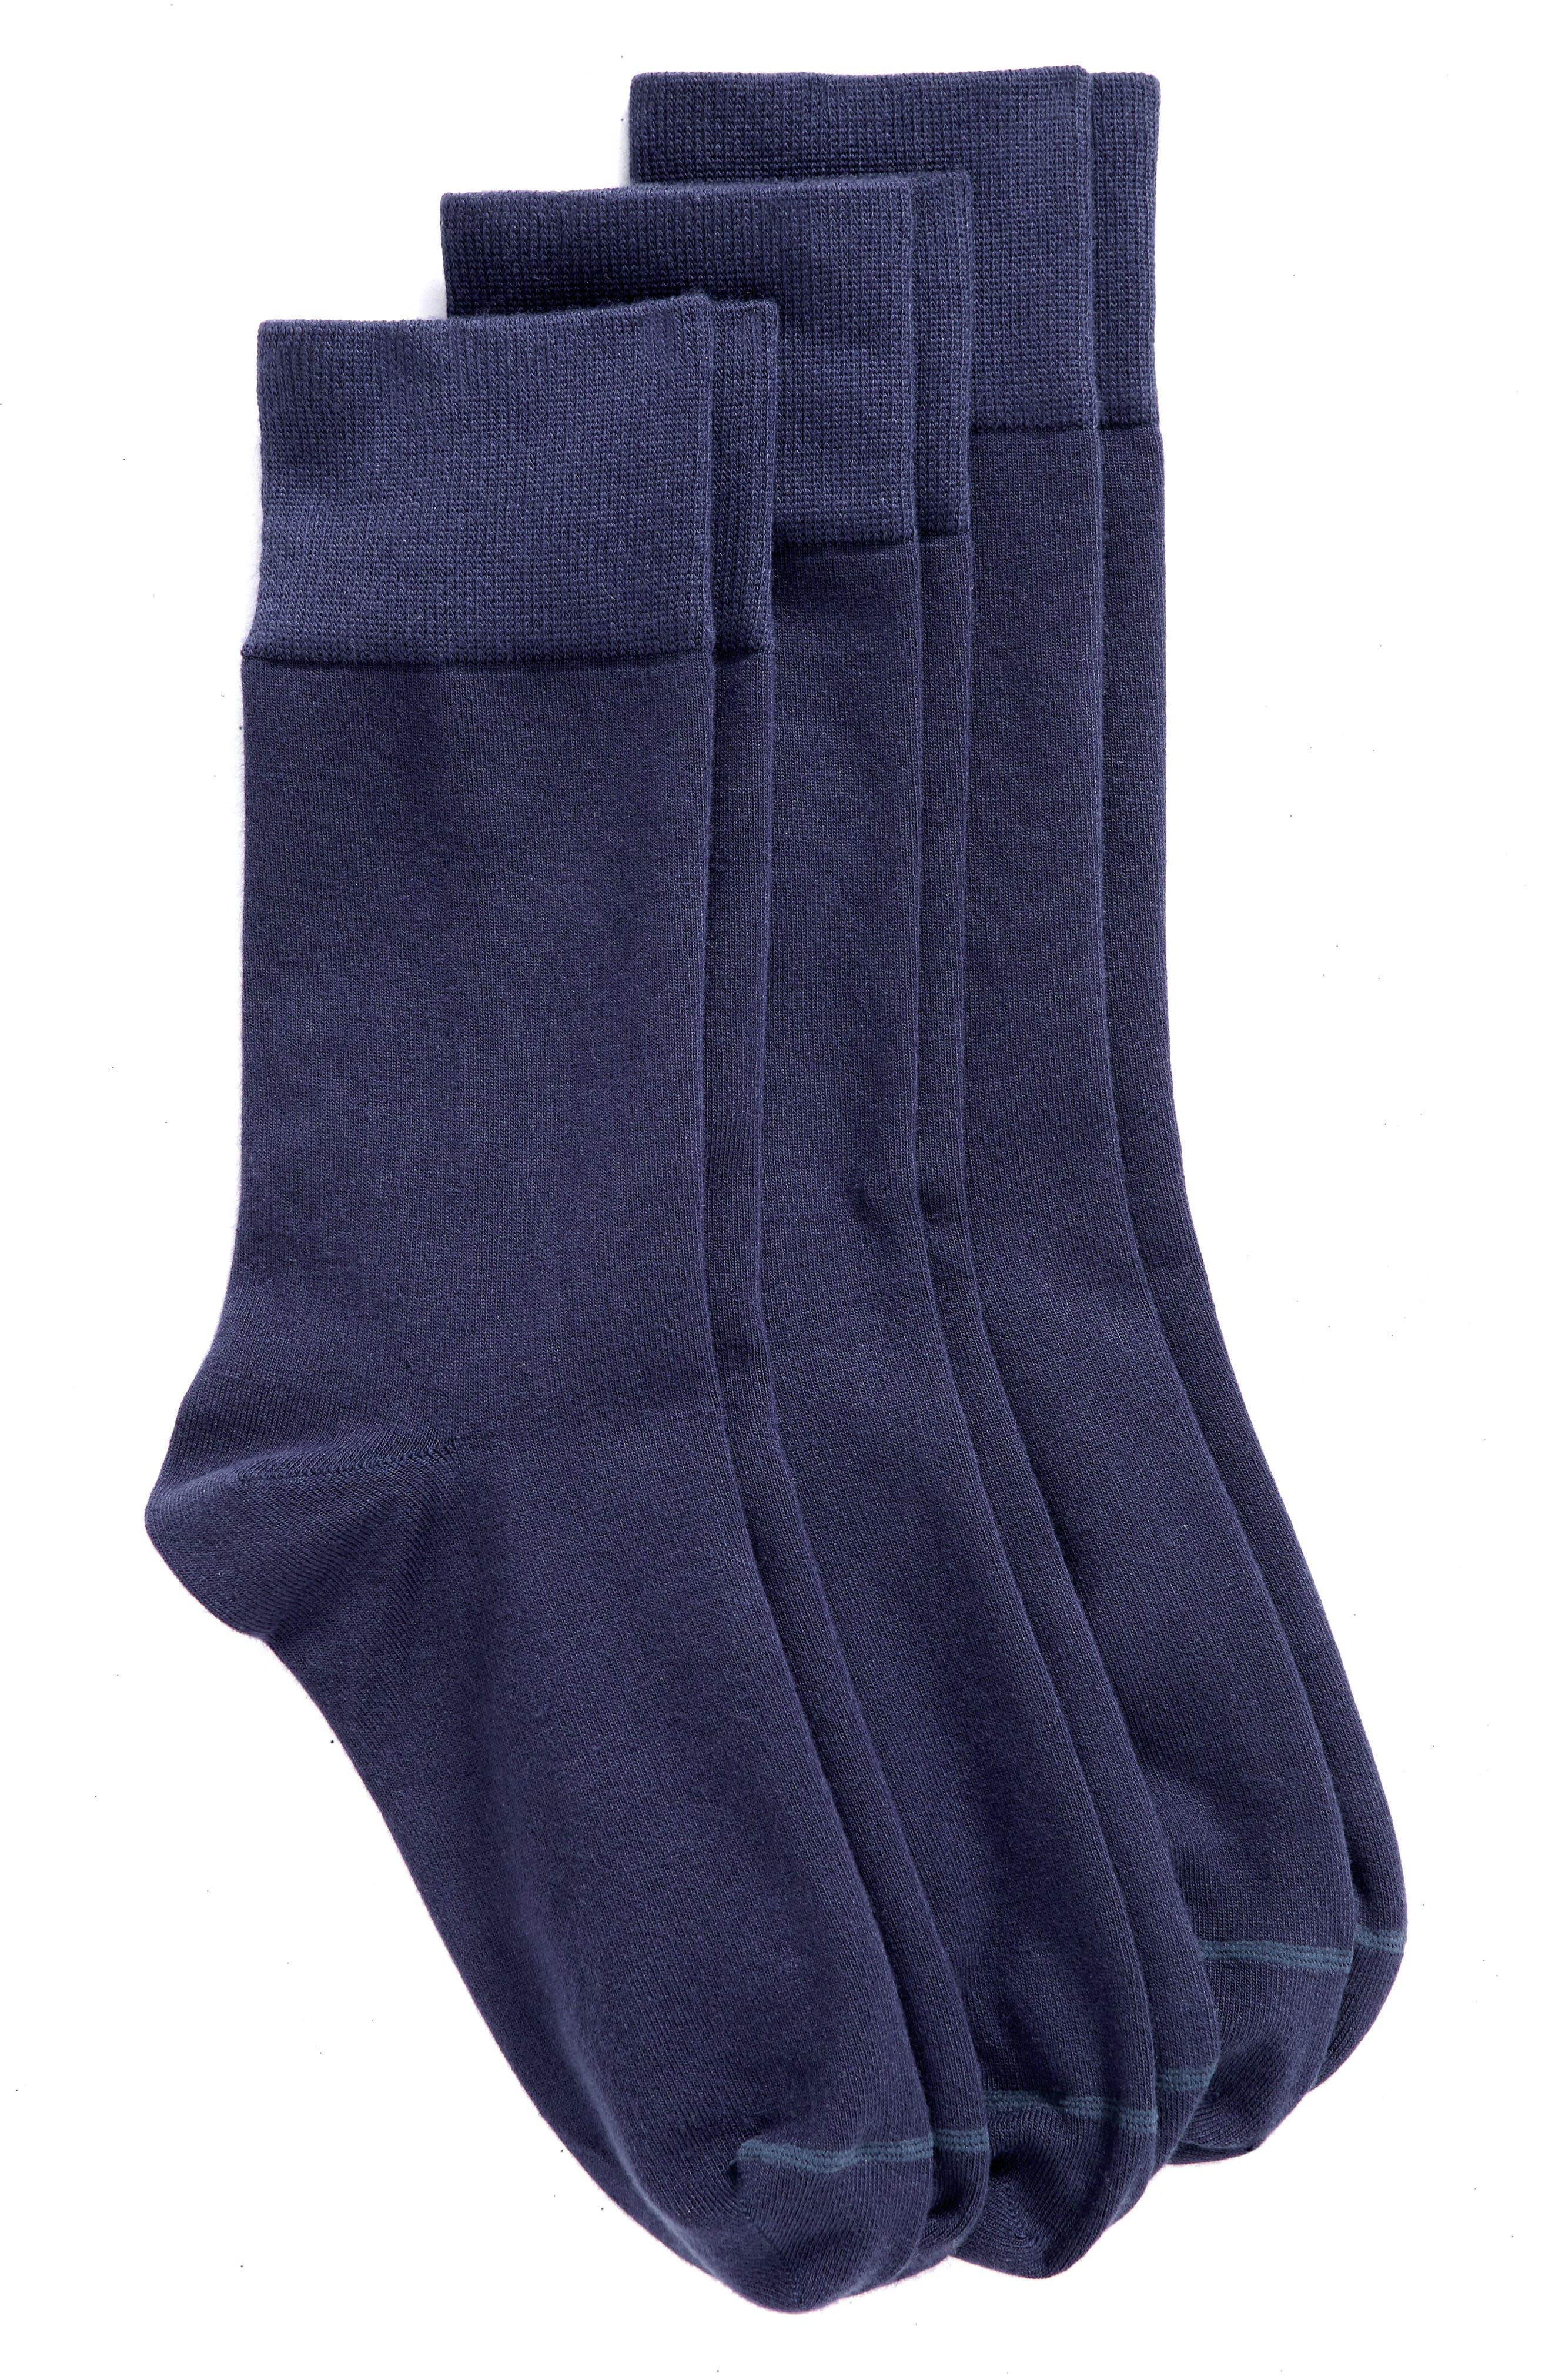 Crew Socks,                             Main thumbnail 1, color,                             Navy